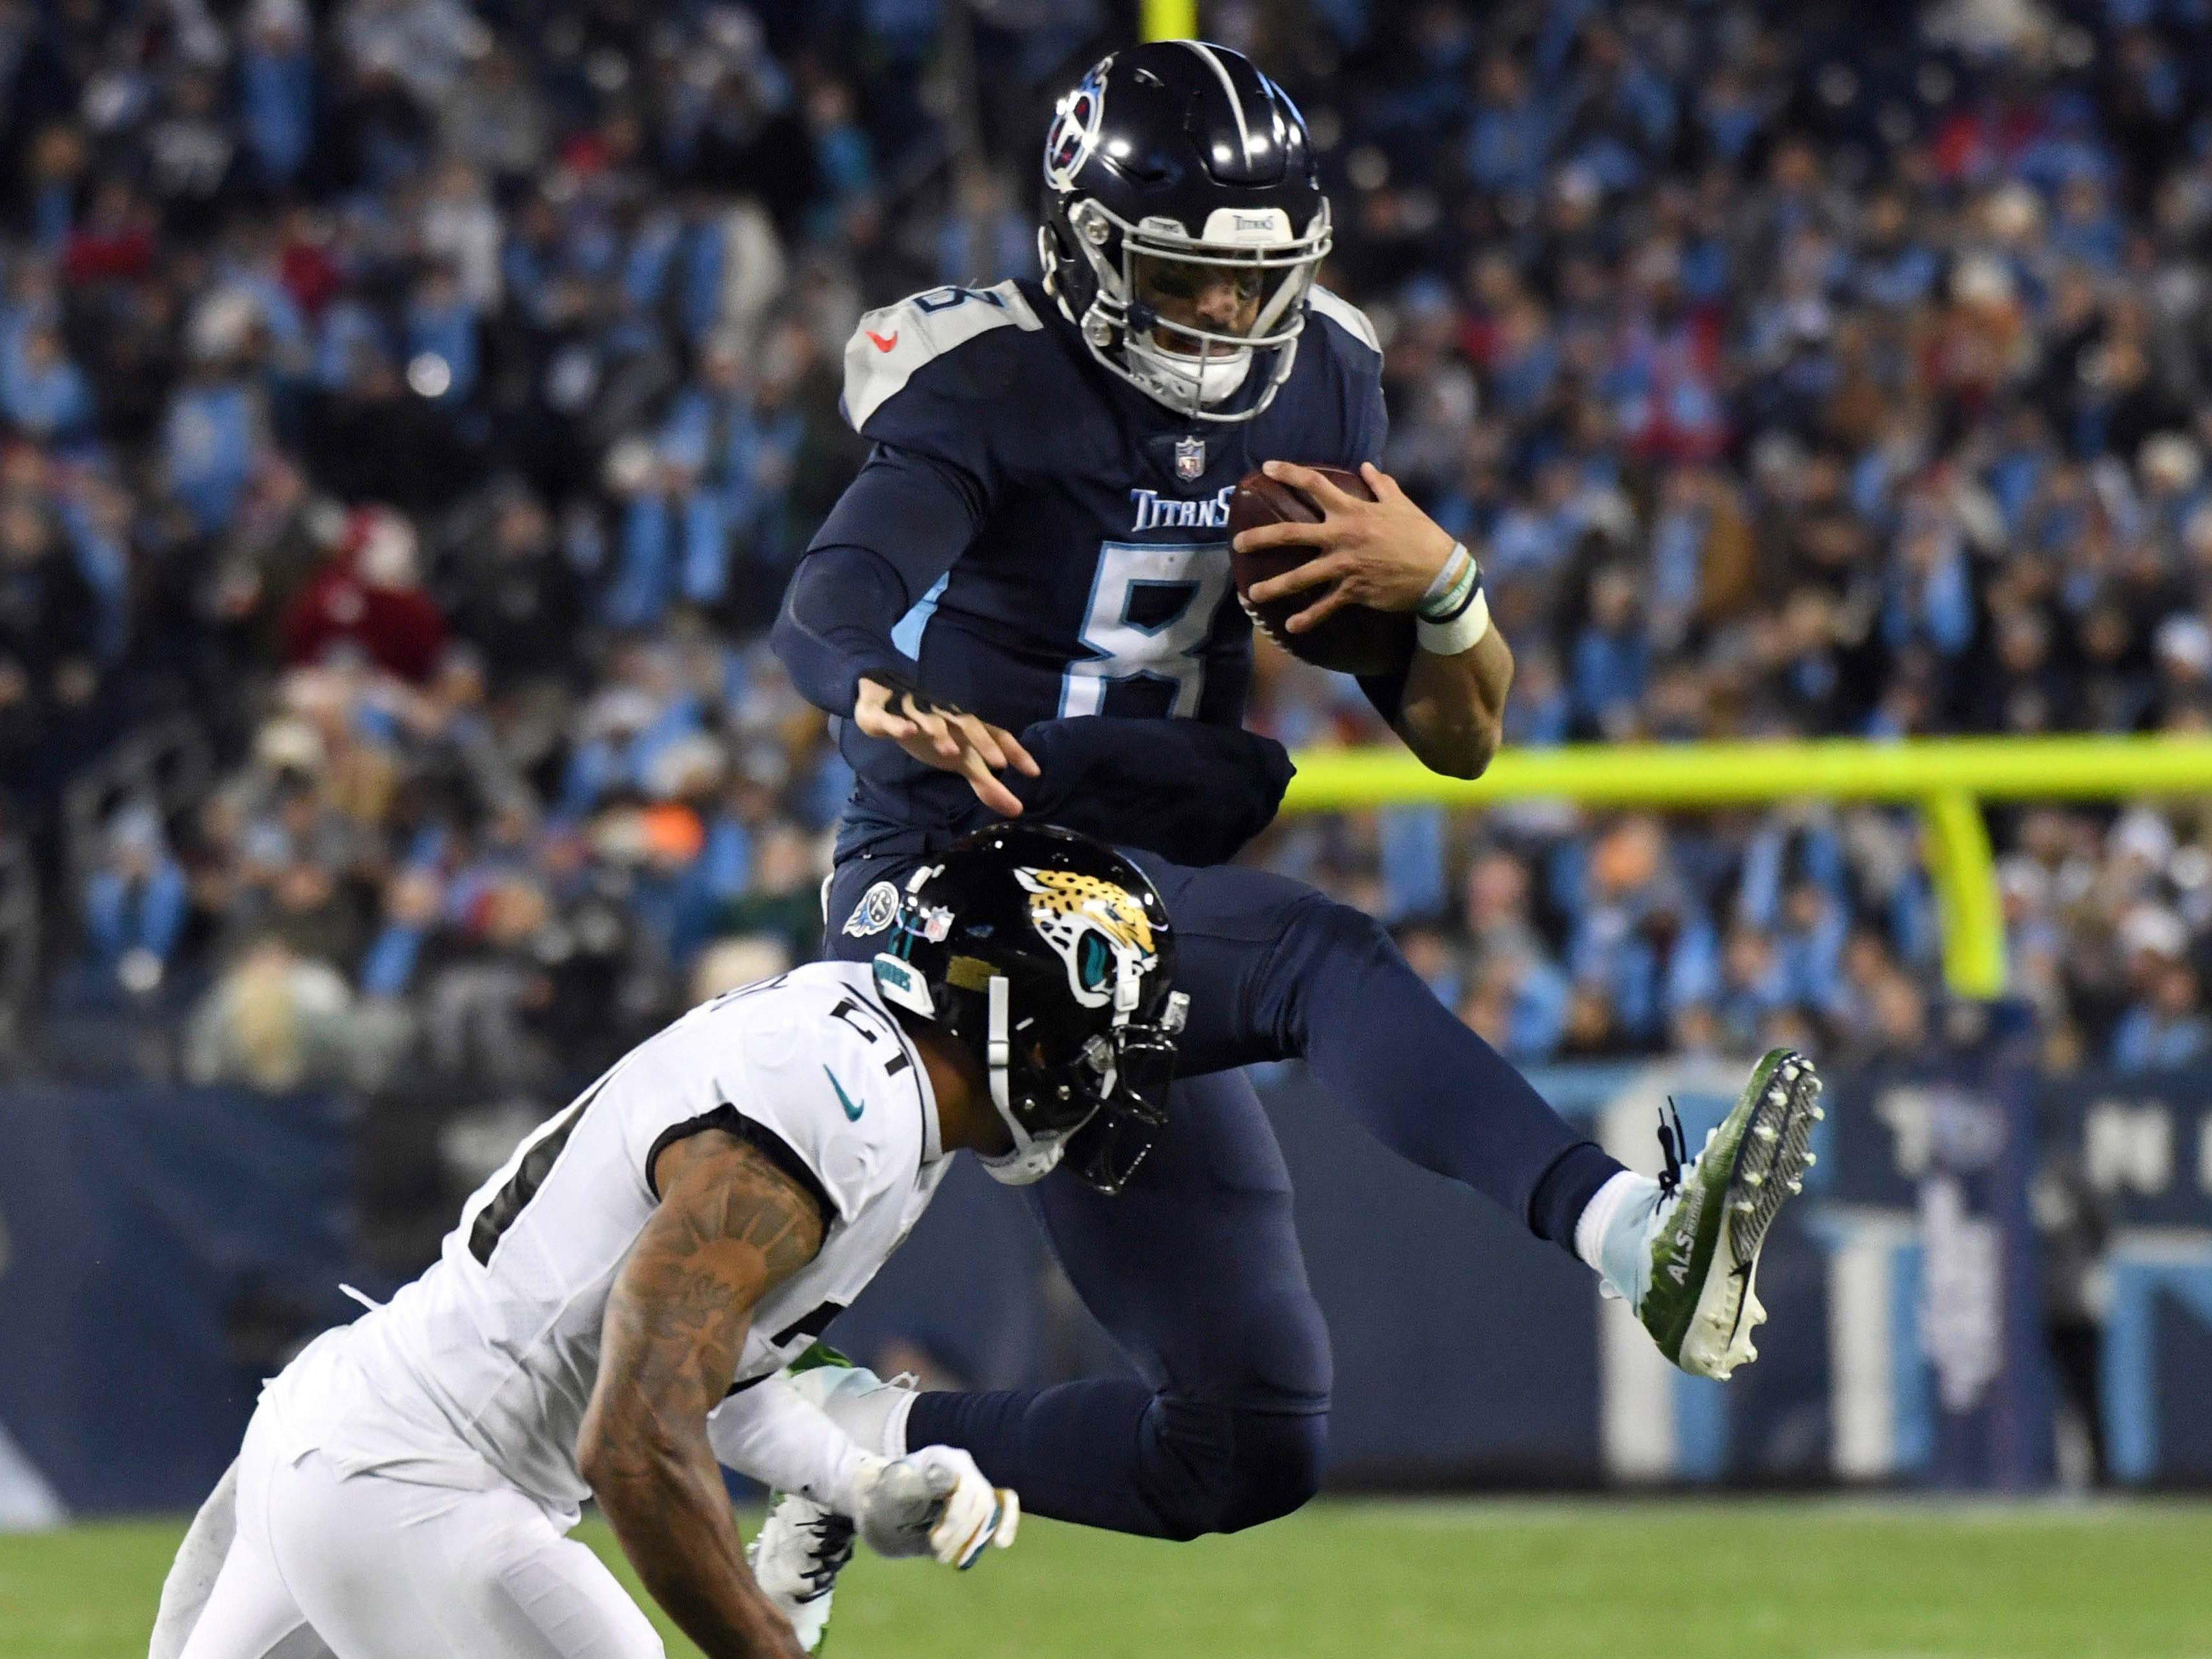 Tennessee Titans quarterback Marcus Mariota leaps over Jacksonville Jaguars cornerback A.J. Bouye in the third quarter at Nissan Stadium.